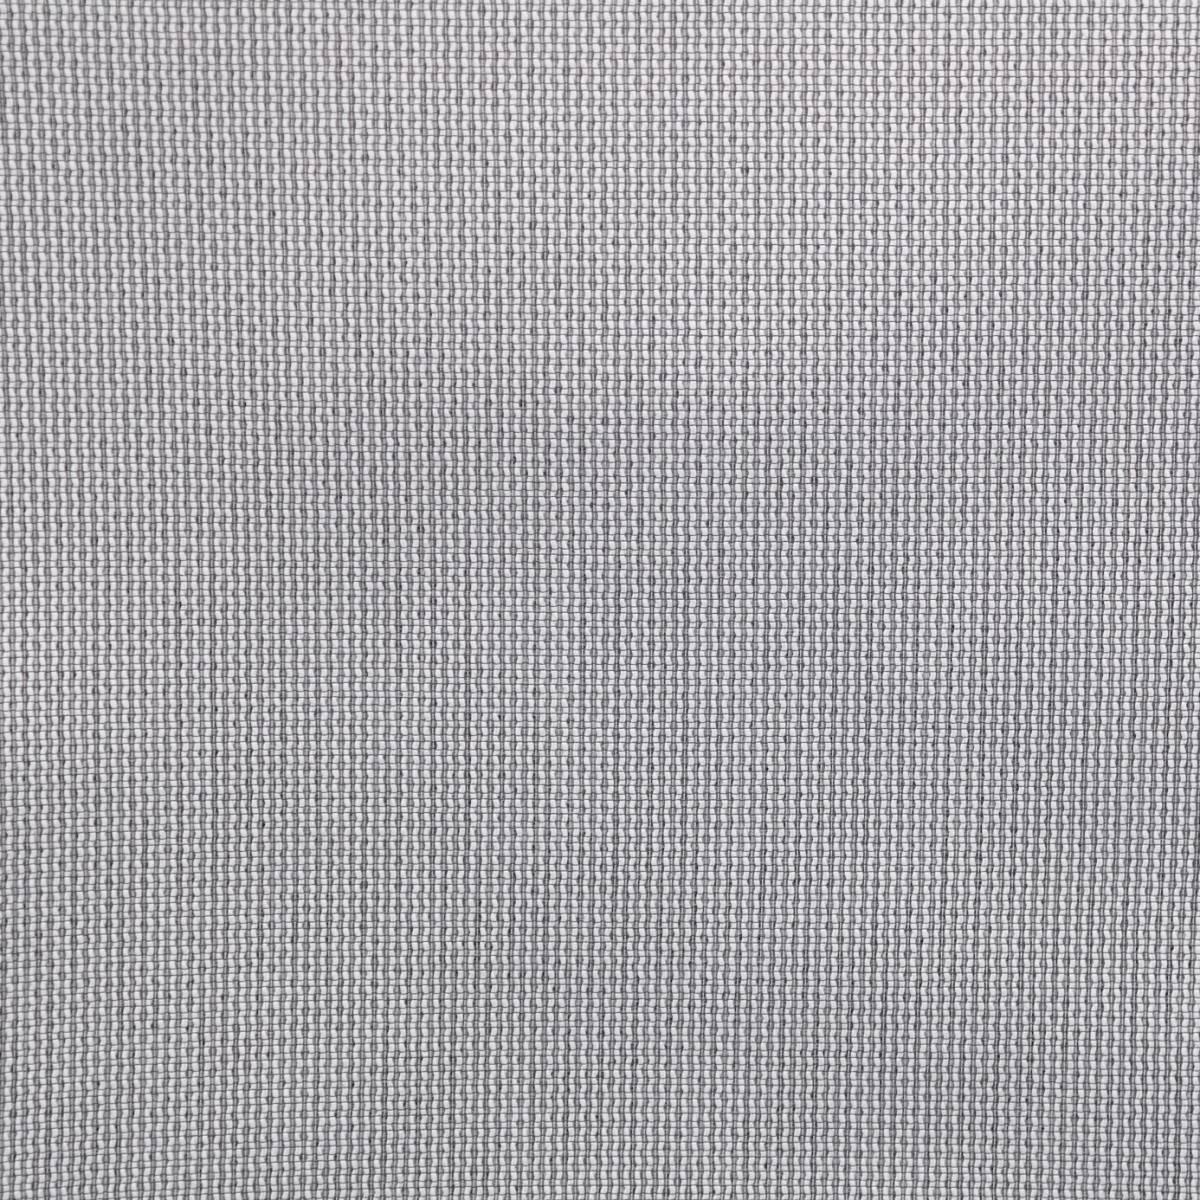 Silver Fabric